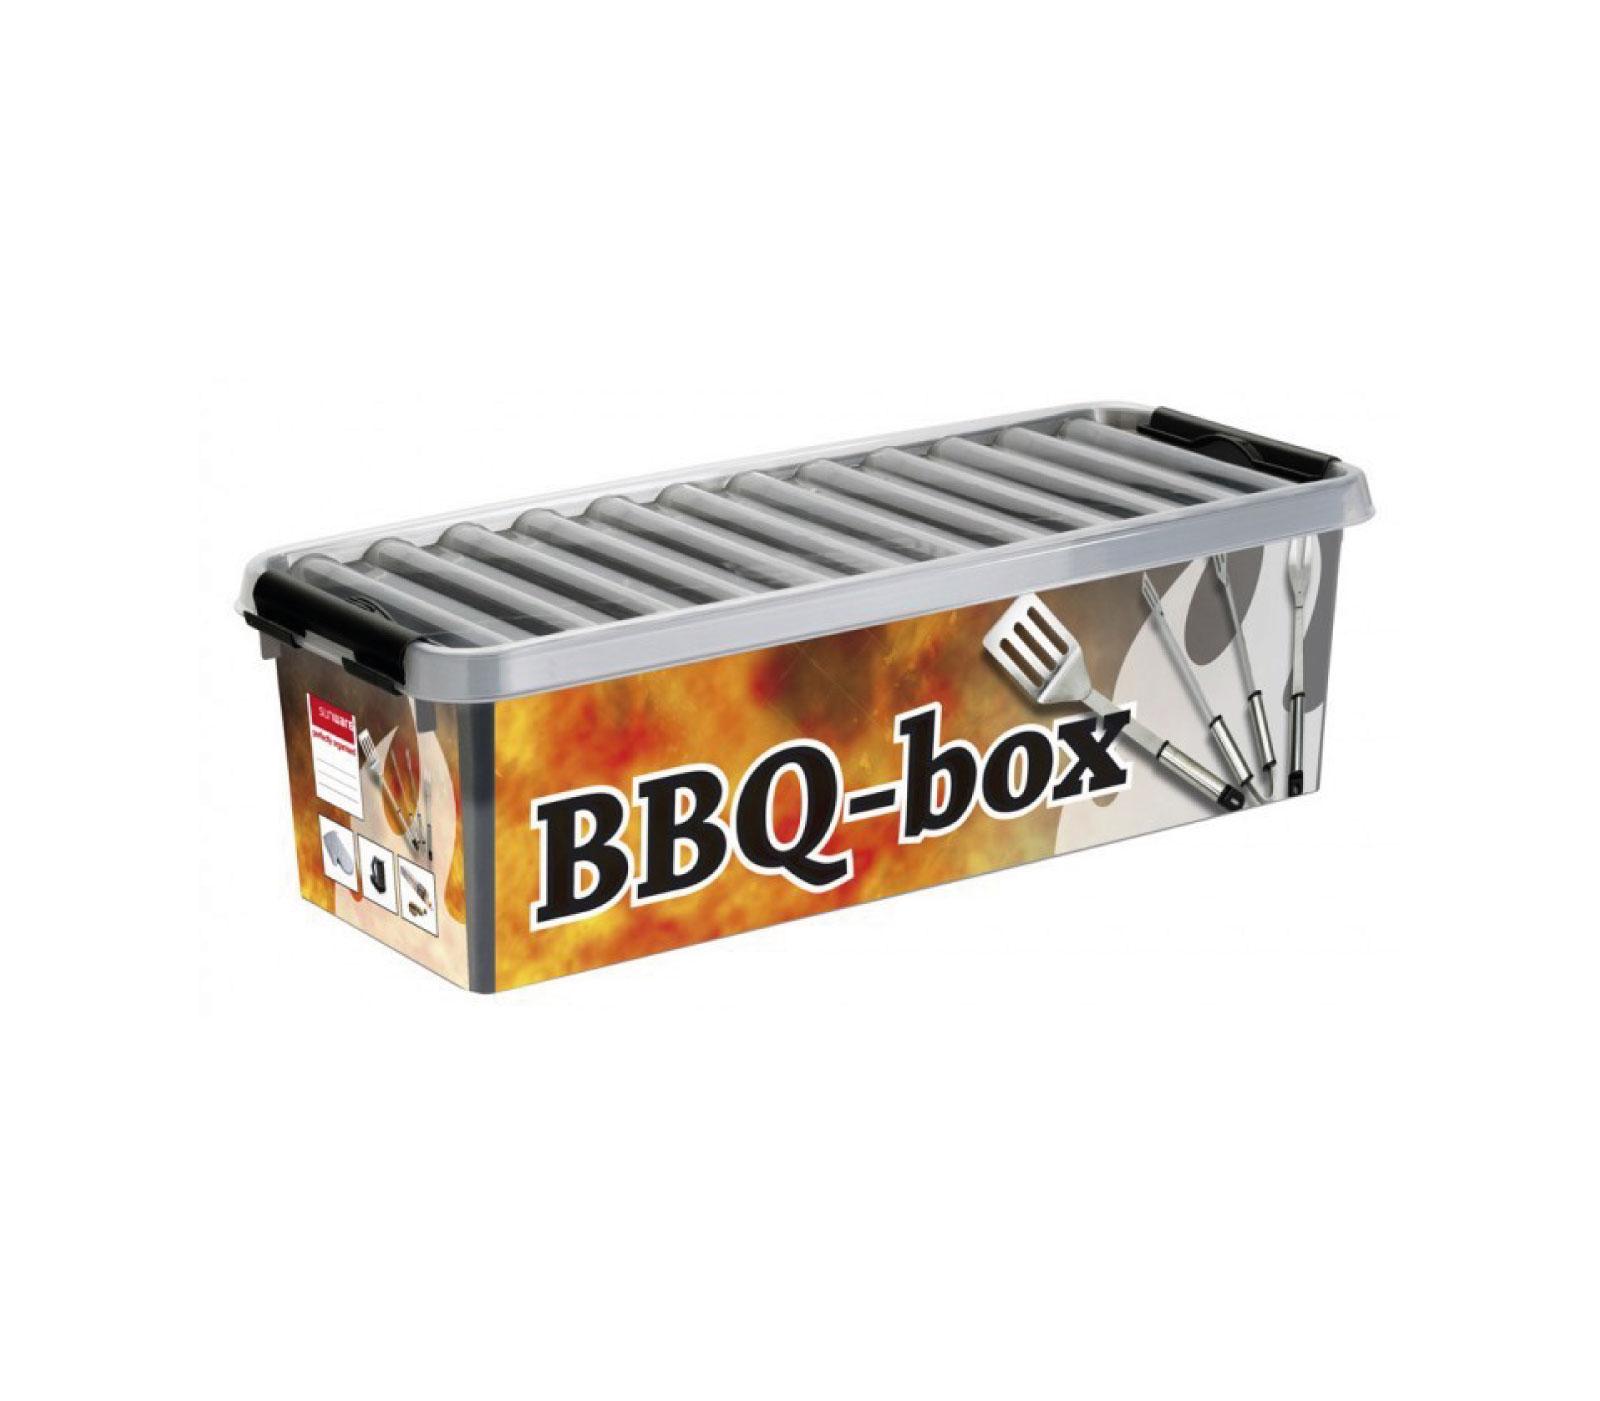 Sunware Bbq Box